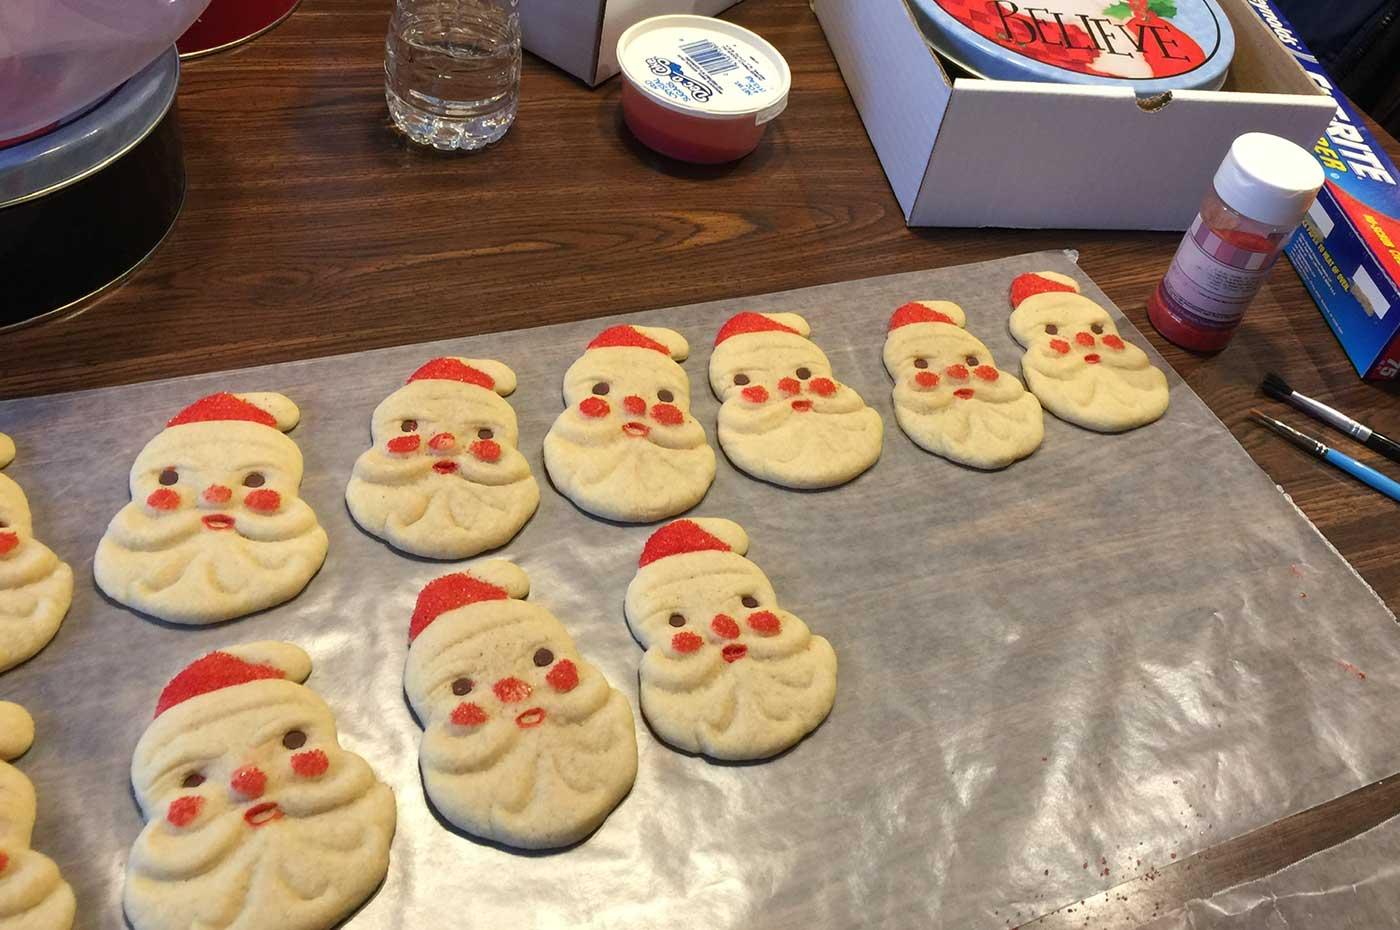 Generations of Santa Cookies